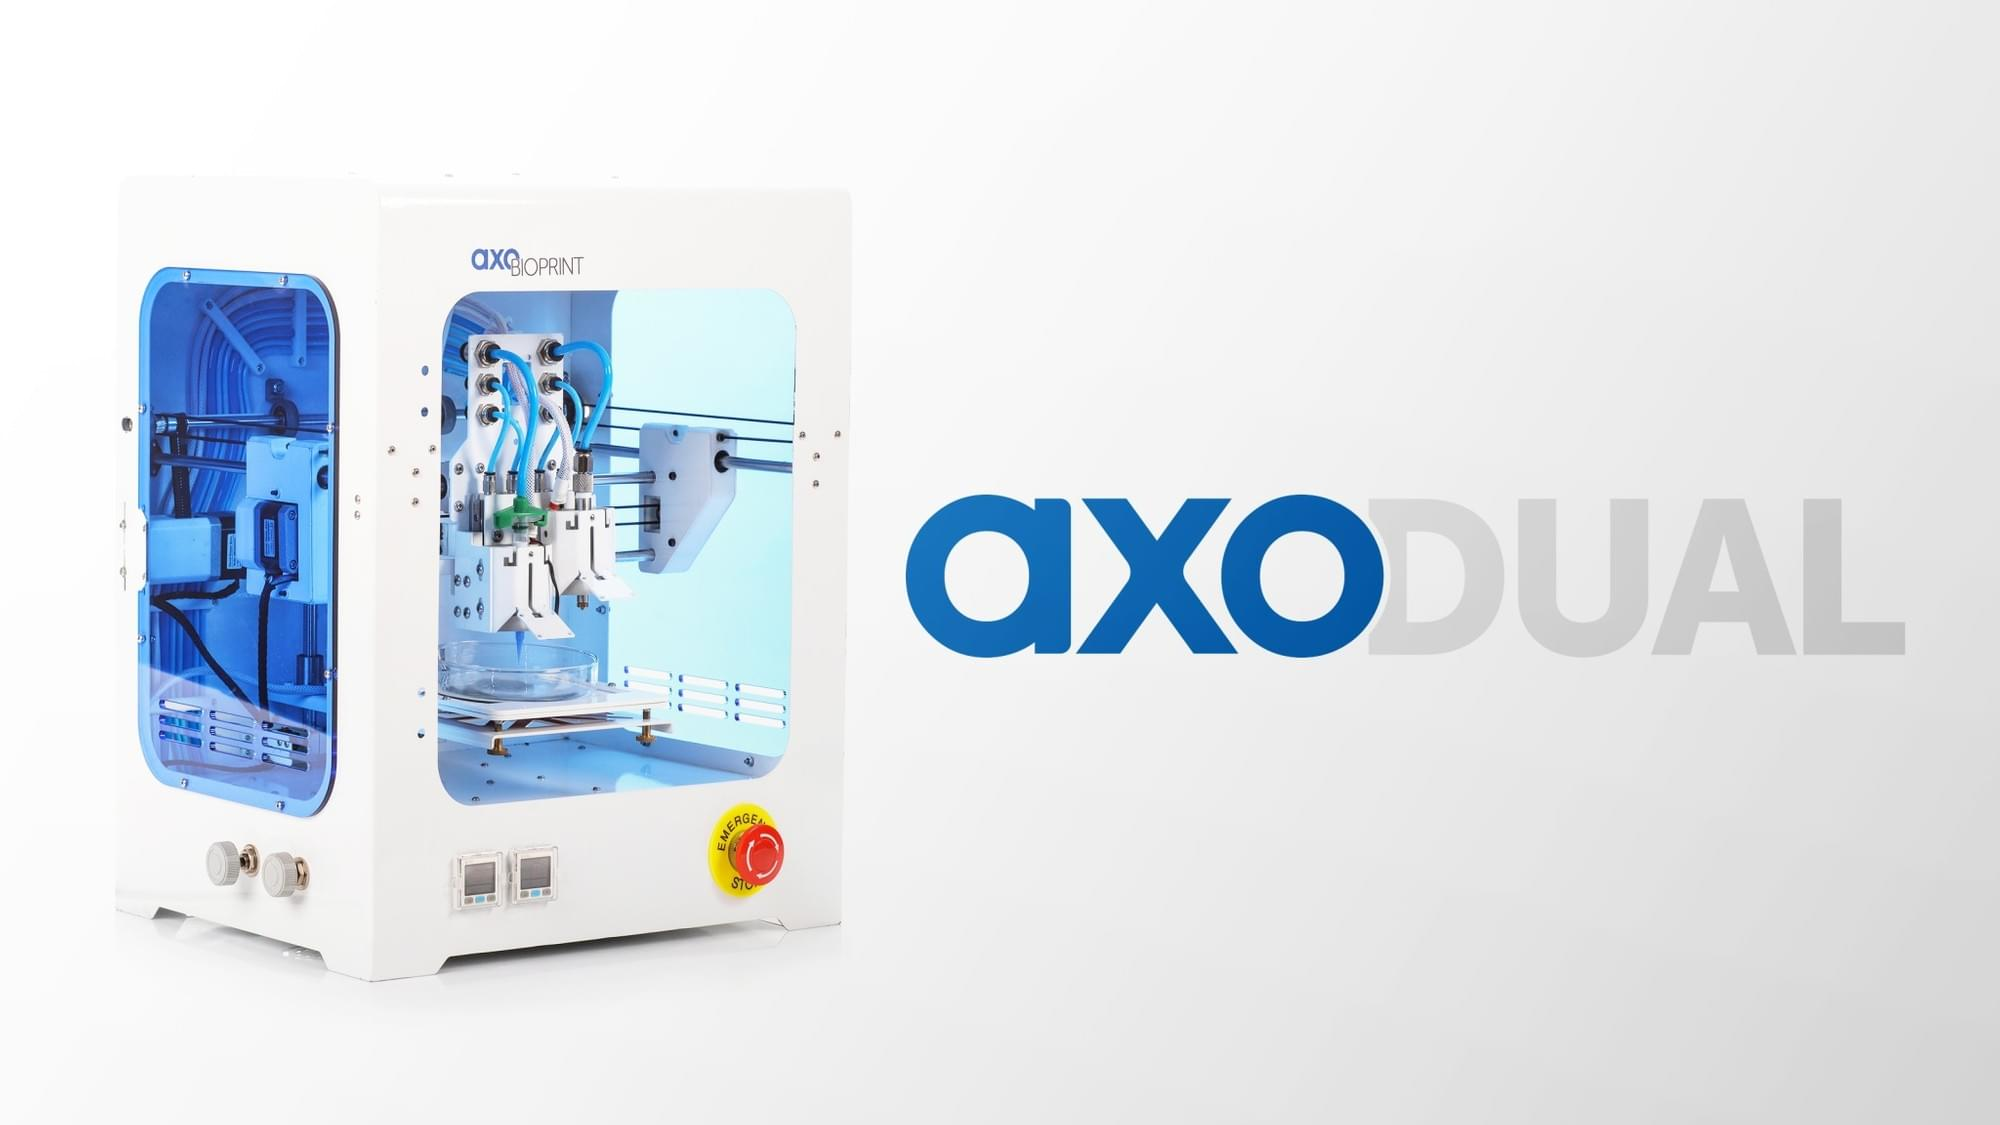 AxoDual